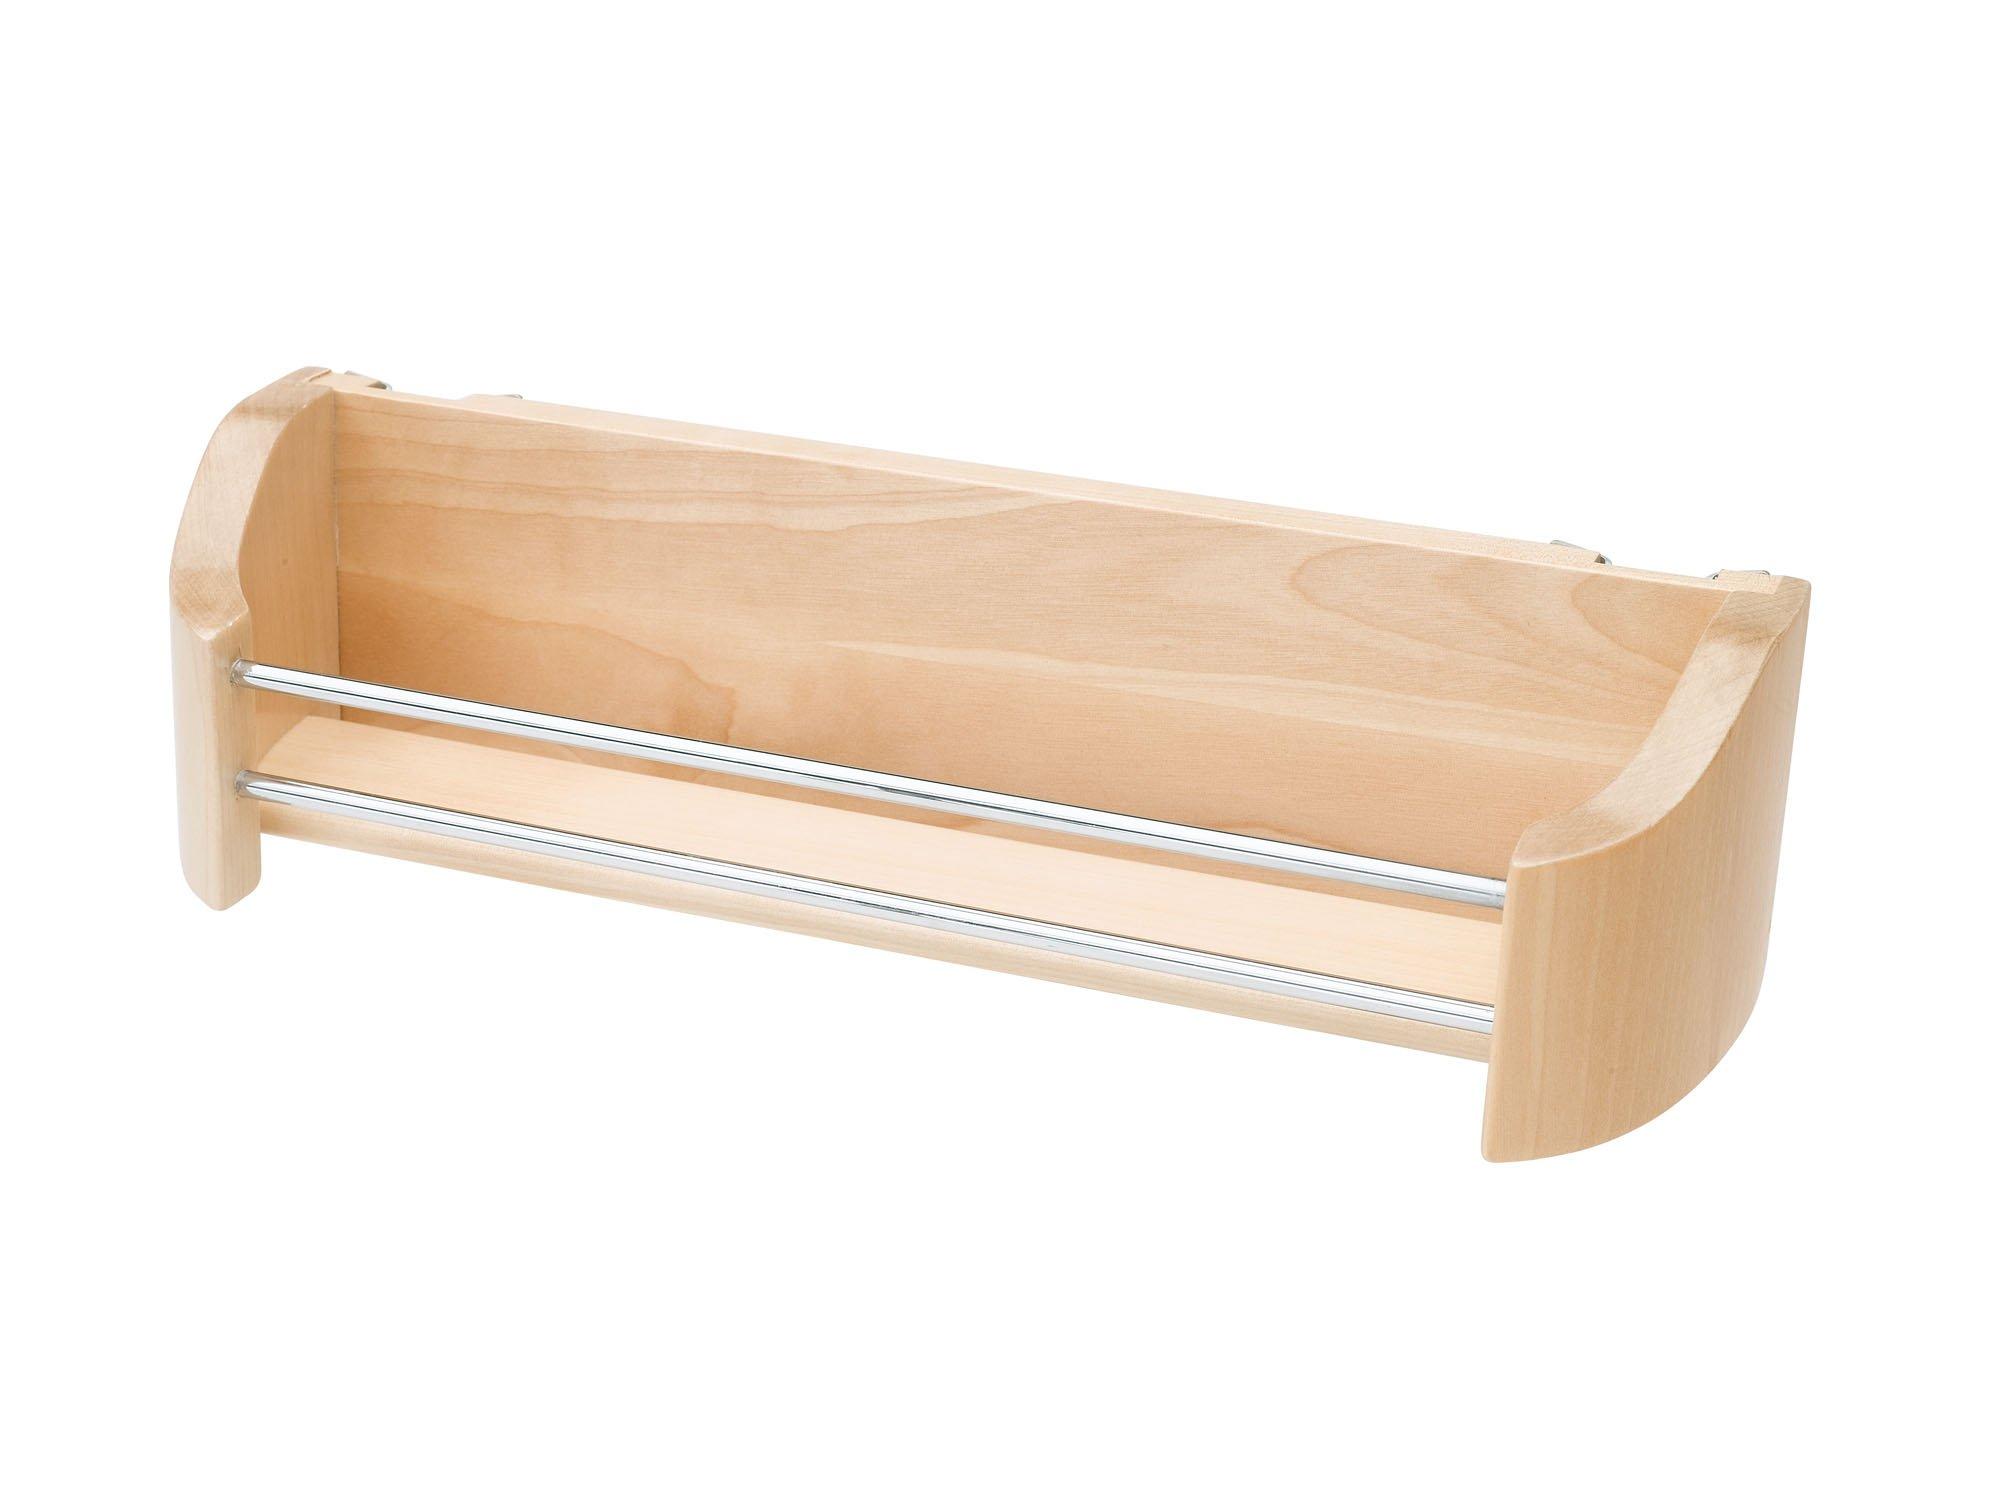 Rev-A-Shelf 4231-20-52 Single Cabinet Door Mount Wood Storage Tray, 20'', Natural